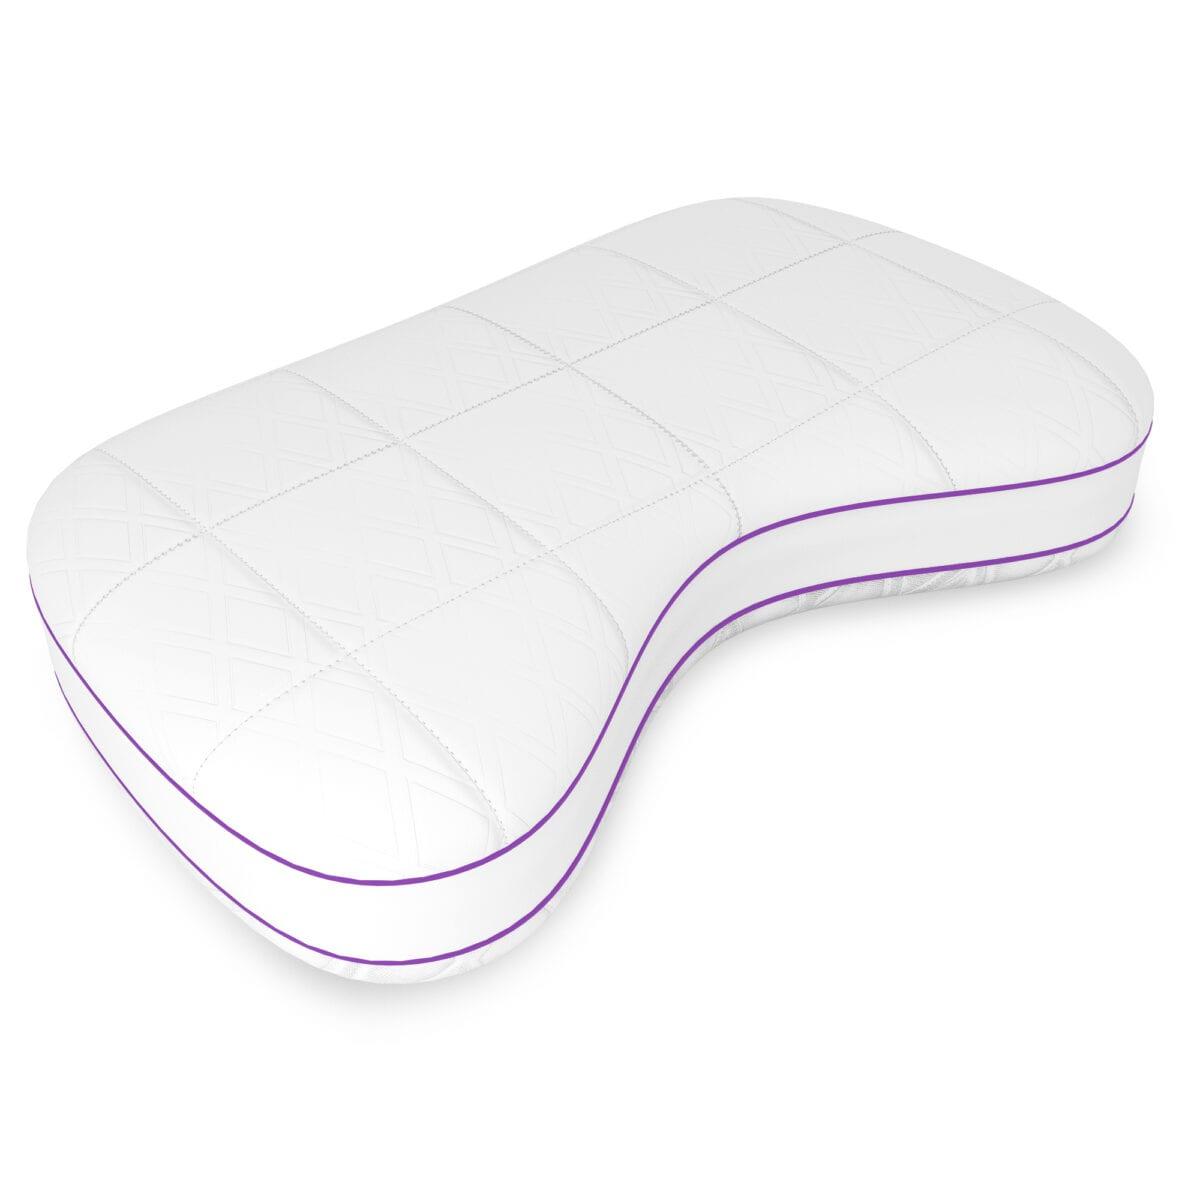 Image of Quest High Profile Memory Comfort Fiber Pillow